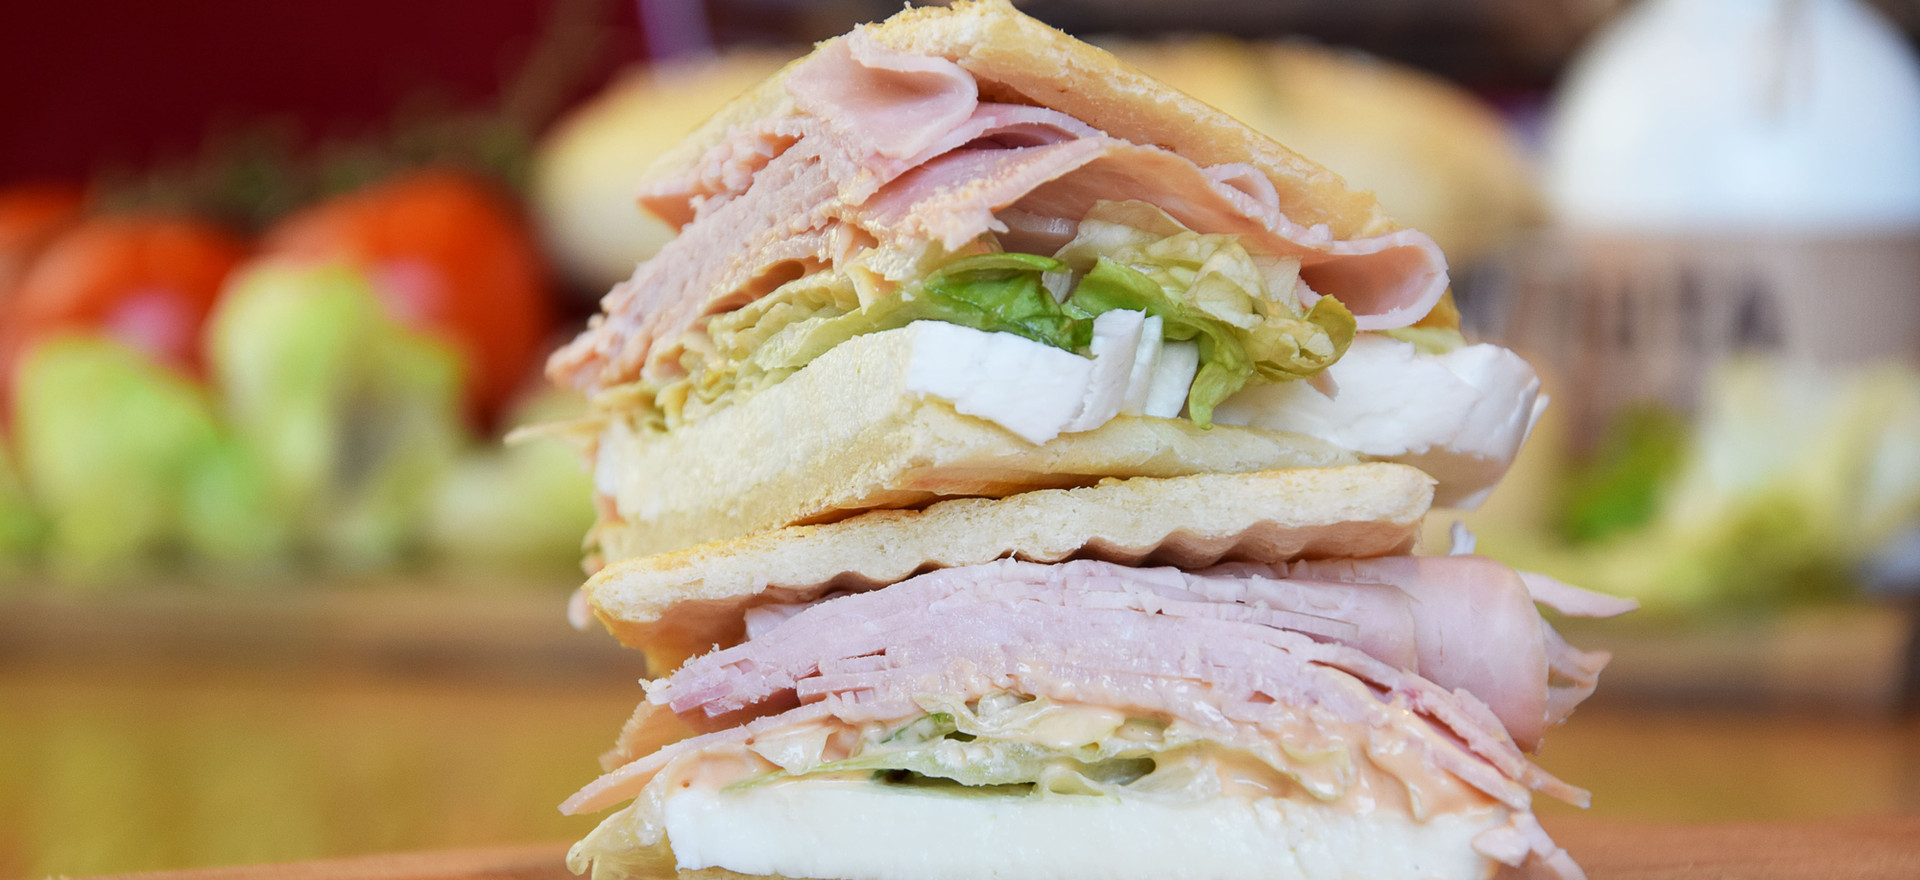 31_food_panino imbruttito_mozza-min.jpg